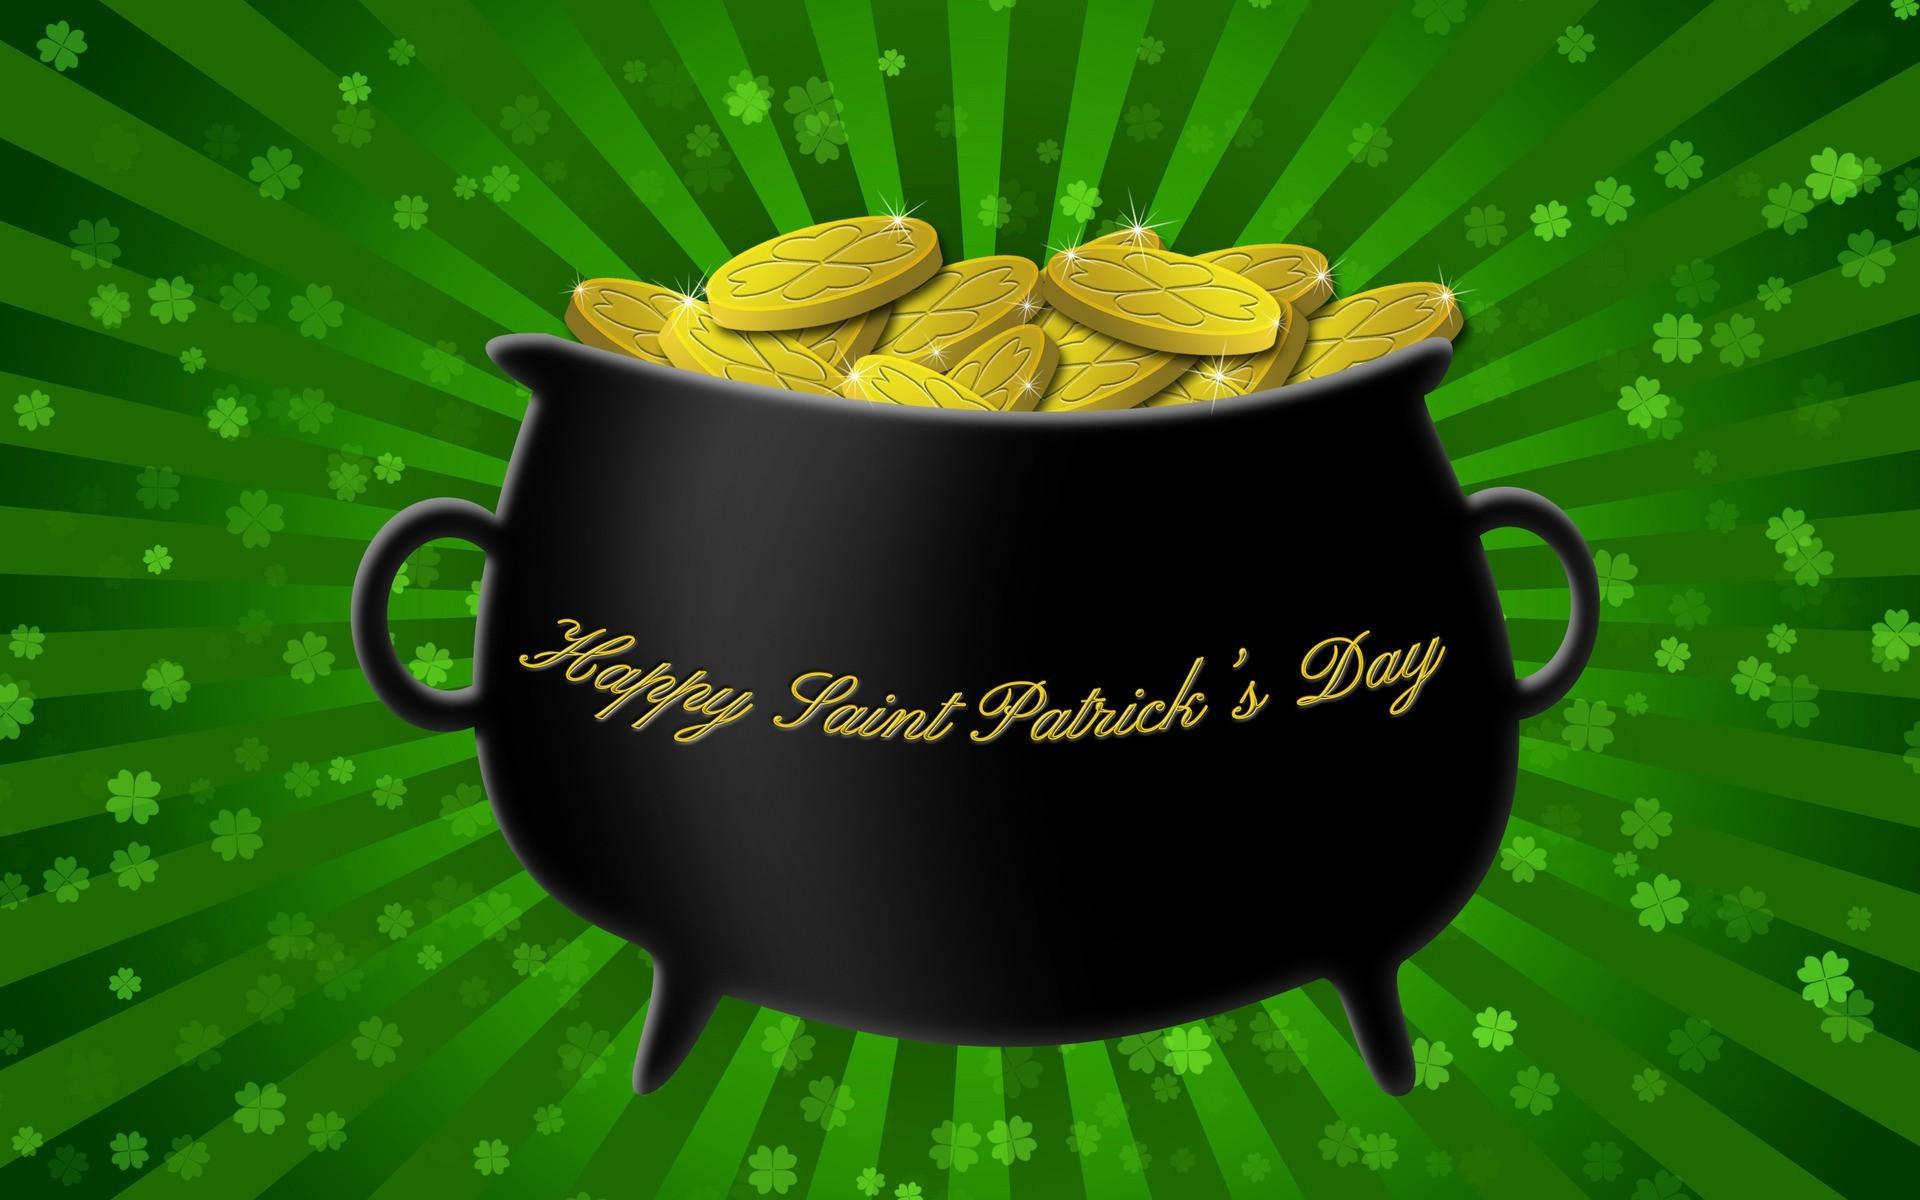 Happy St. Patrick's Day gold pot wallpaper